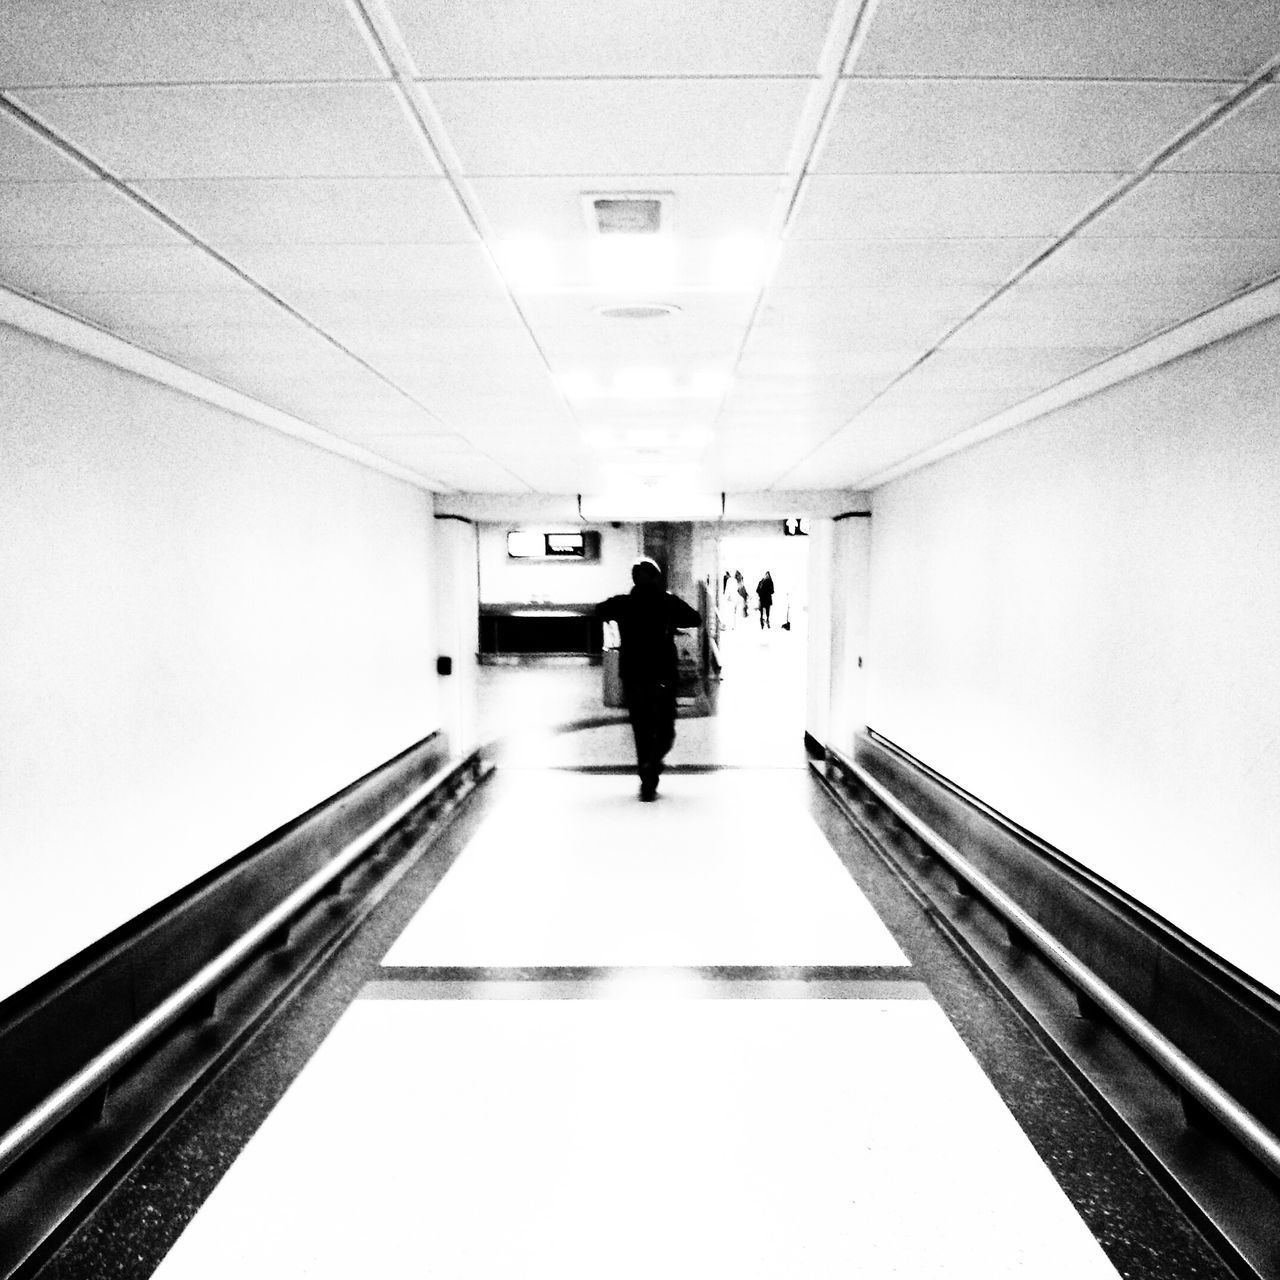 REAR VIEW OF MAN STANDING ON ESCALATOR IN ILLUMINATED UNDERGROUND